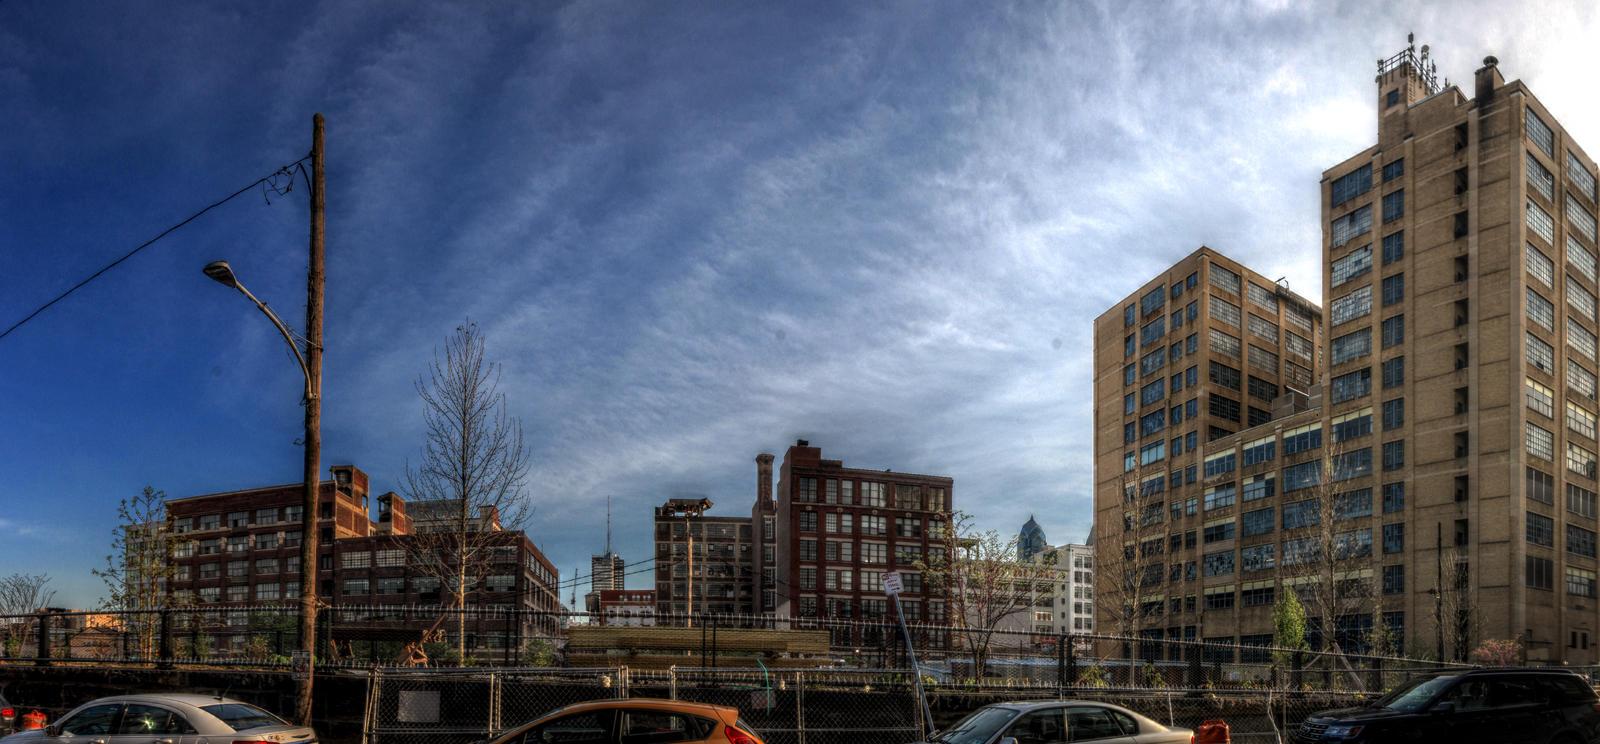 Panorama 3634 hdr pregamma 1 mantiuk06 contrast ma